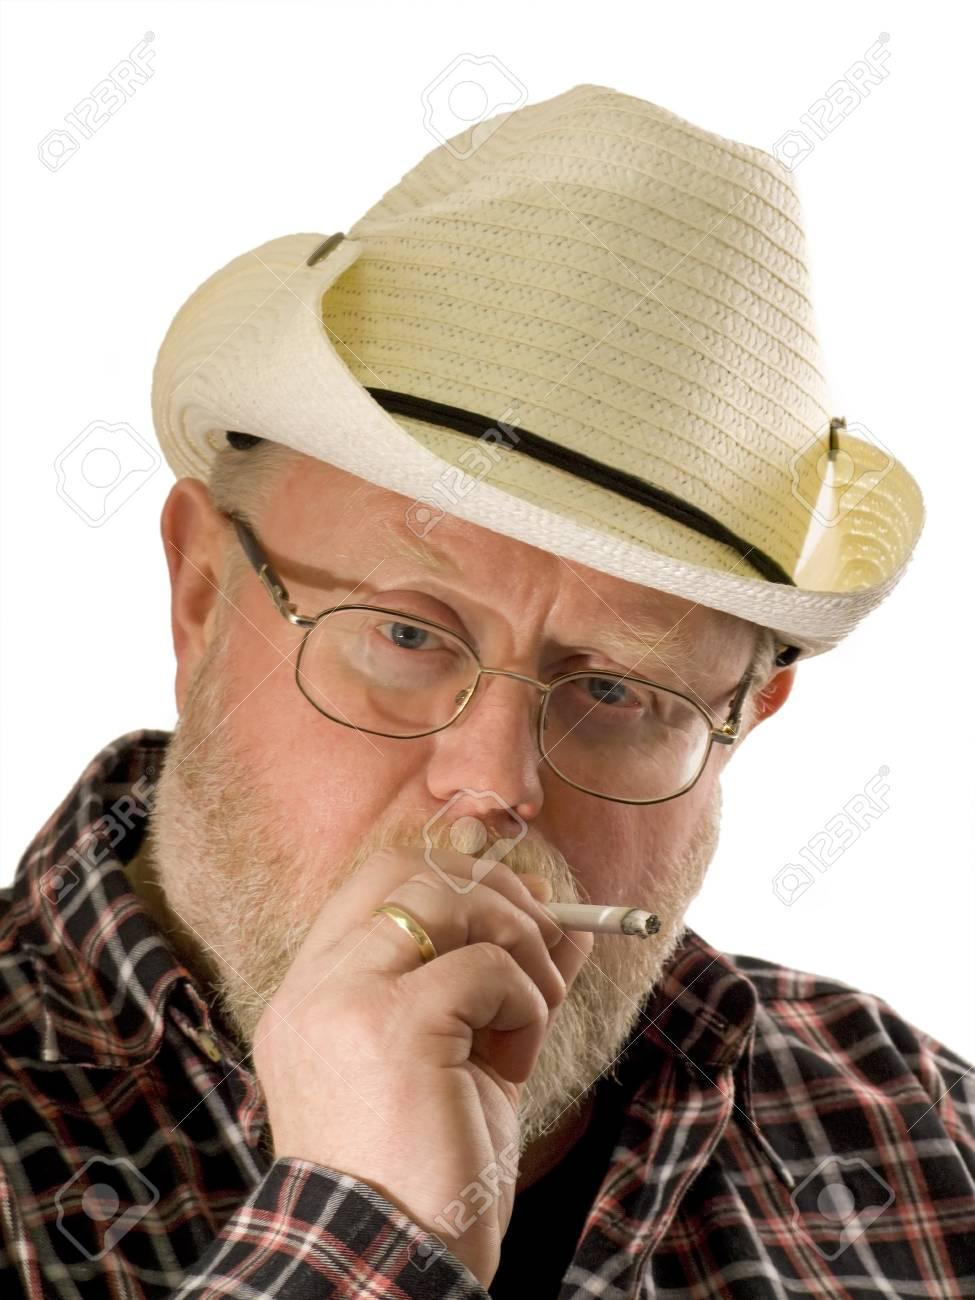 Smoking man on white background. Shot in studio. Stock Photo - 4325390